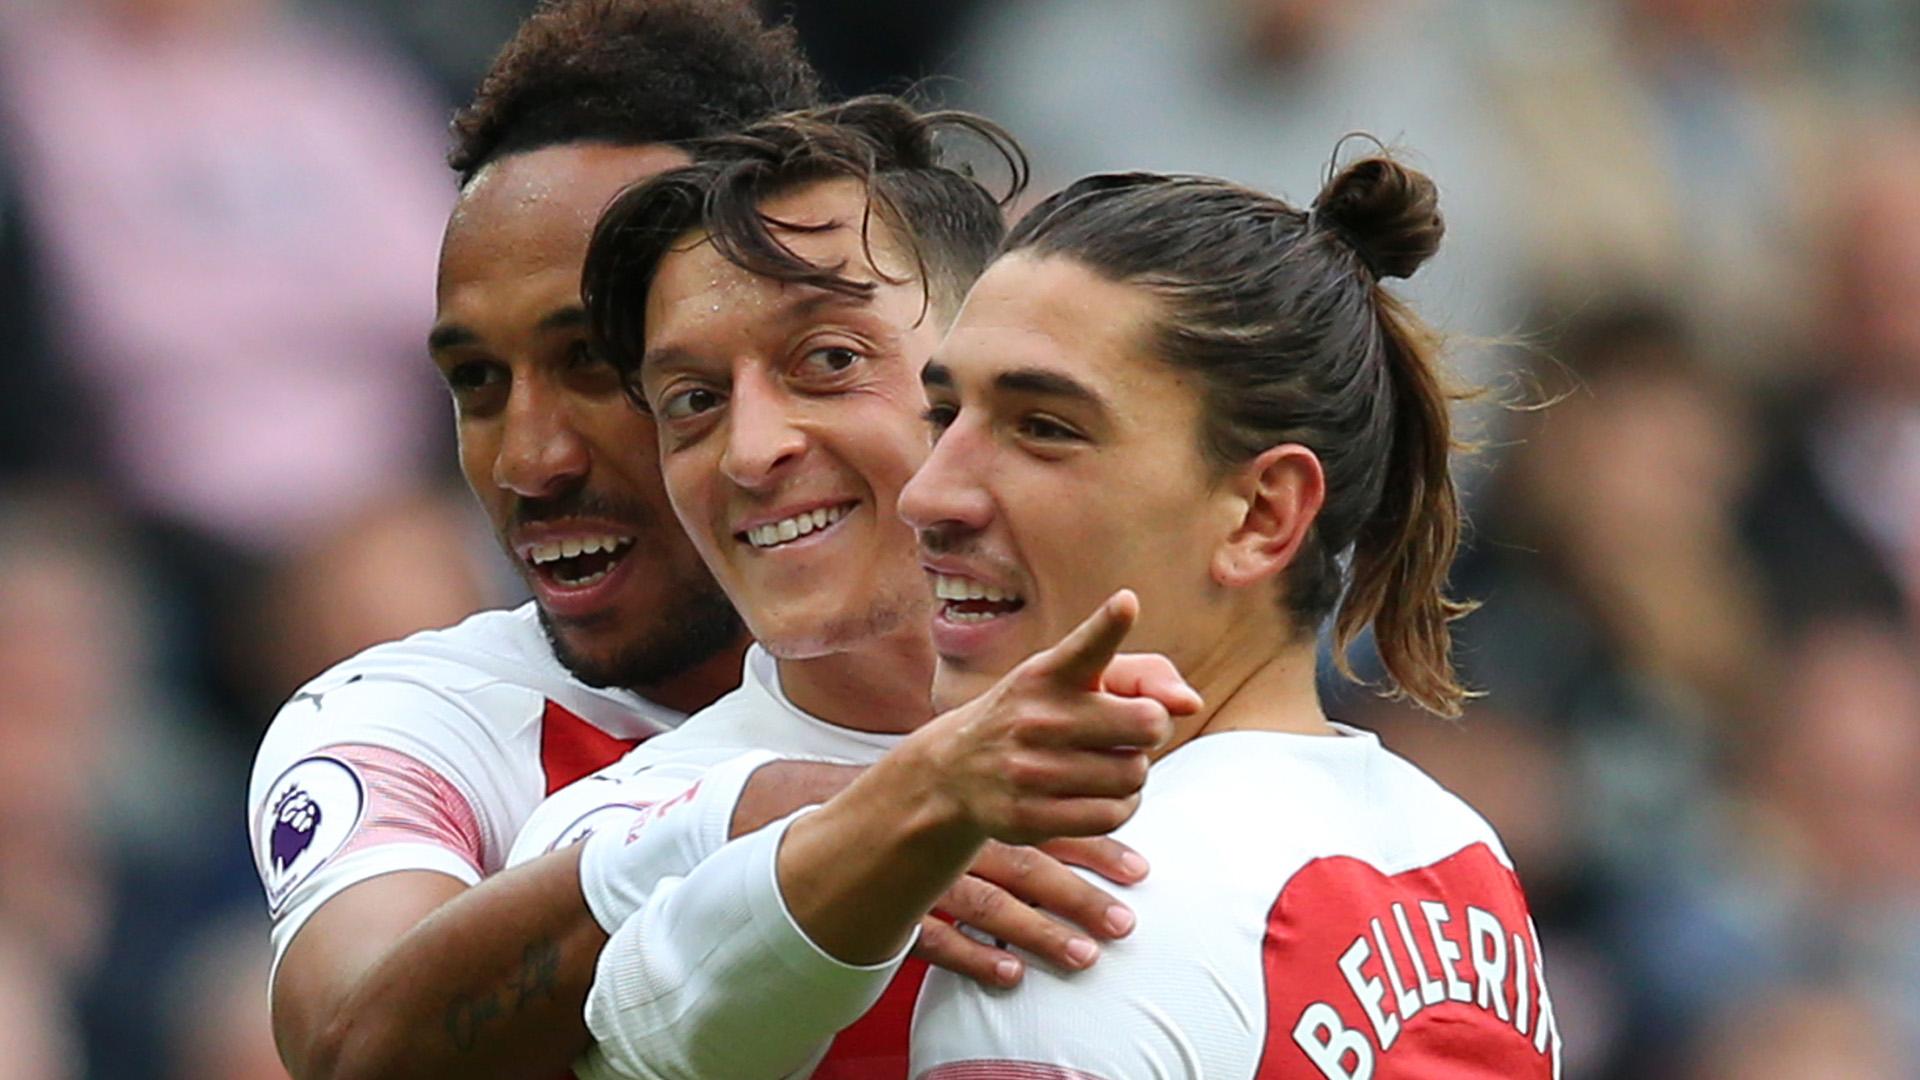 Arsenal Premier League fixtures: Full 2019-20 match schedule